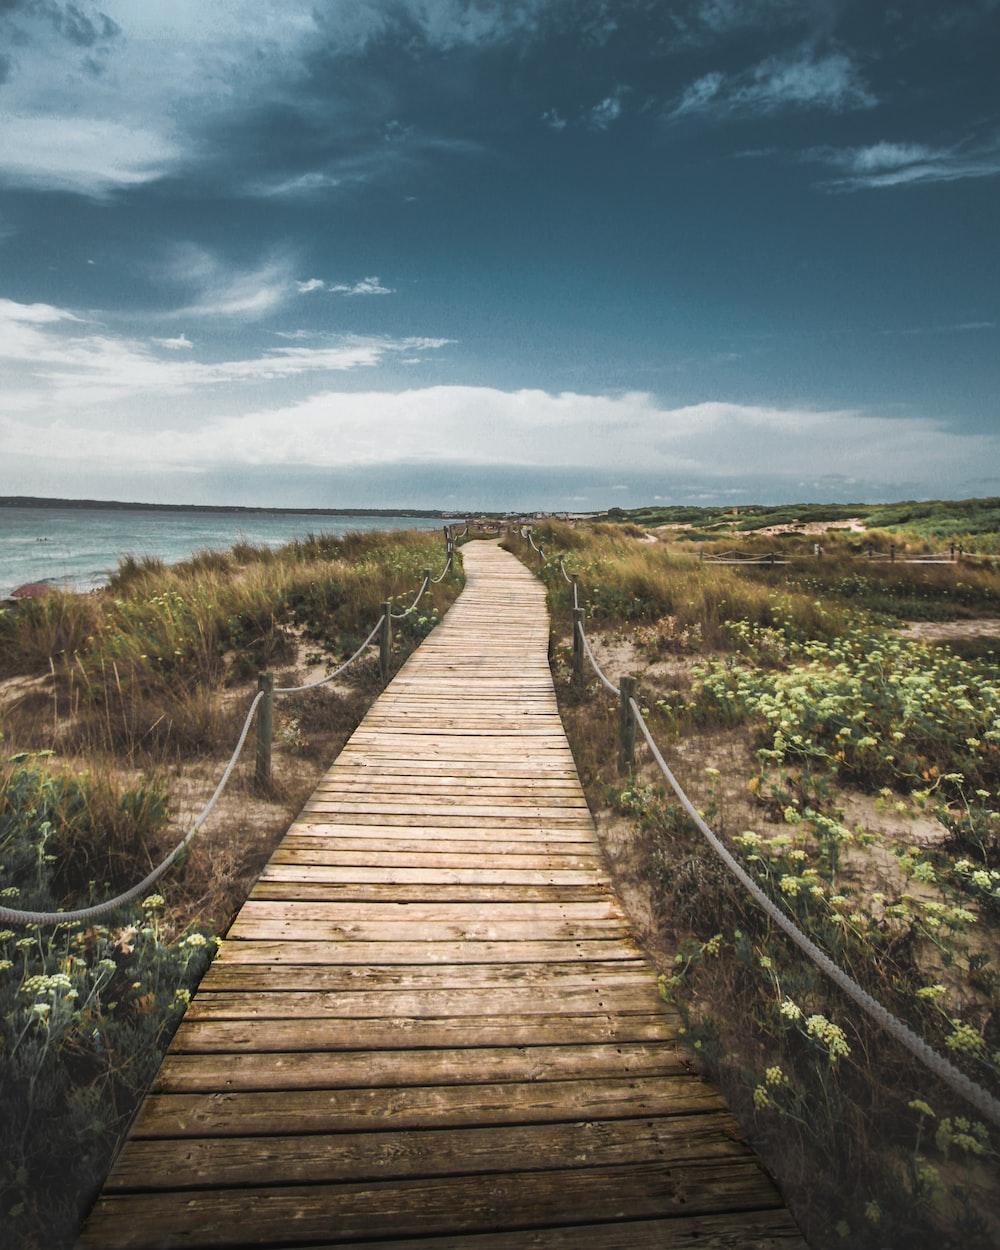 wooden pathway through seashore